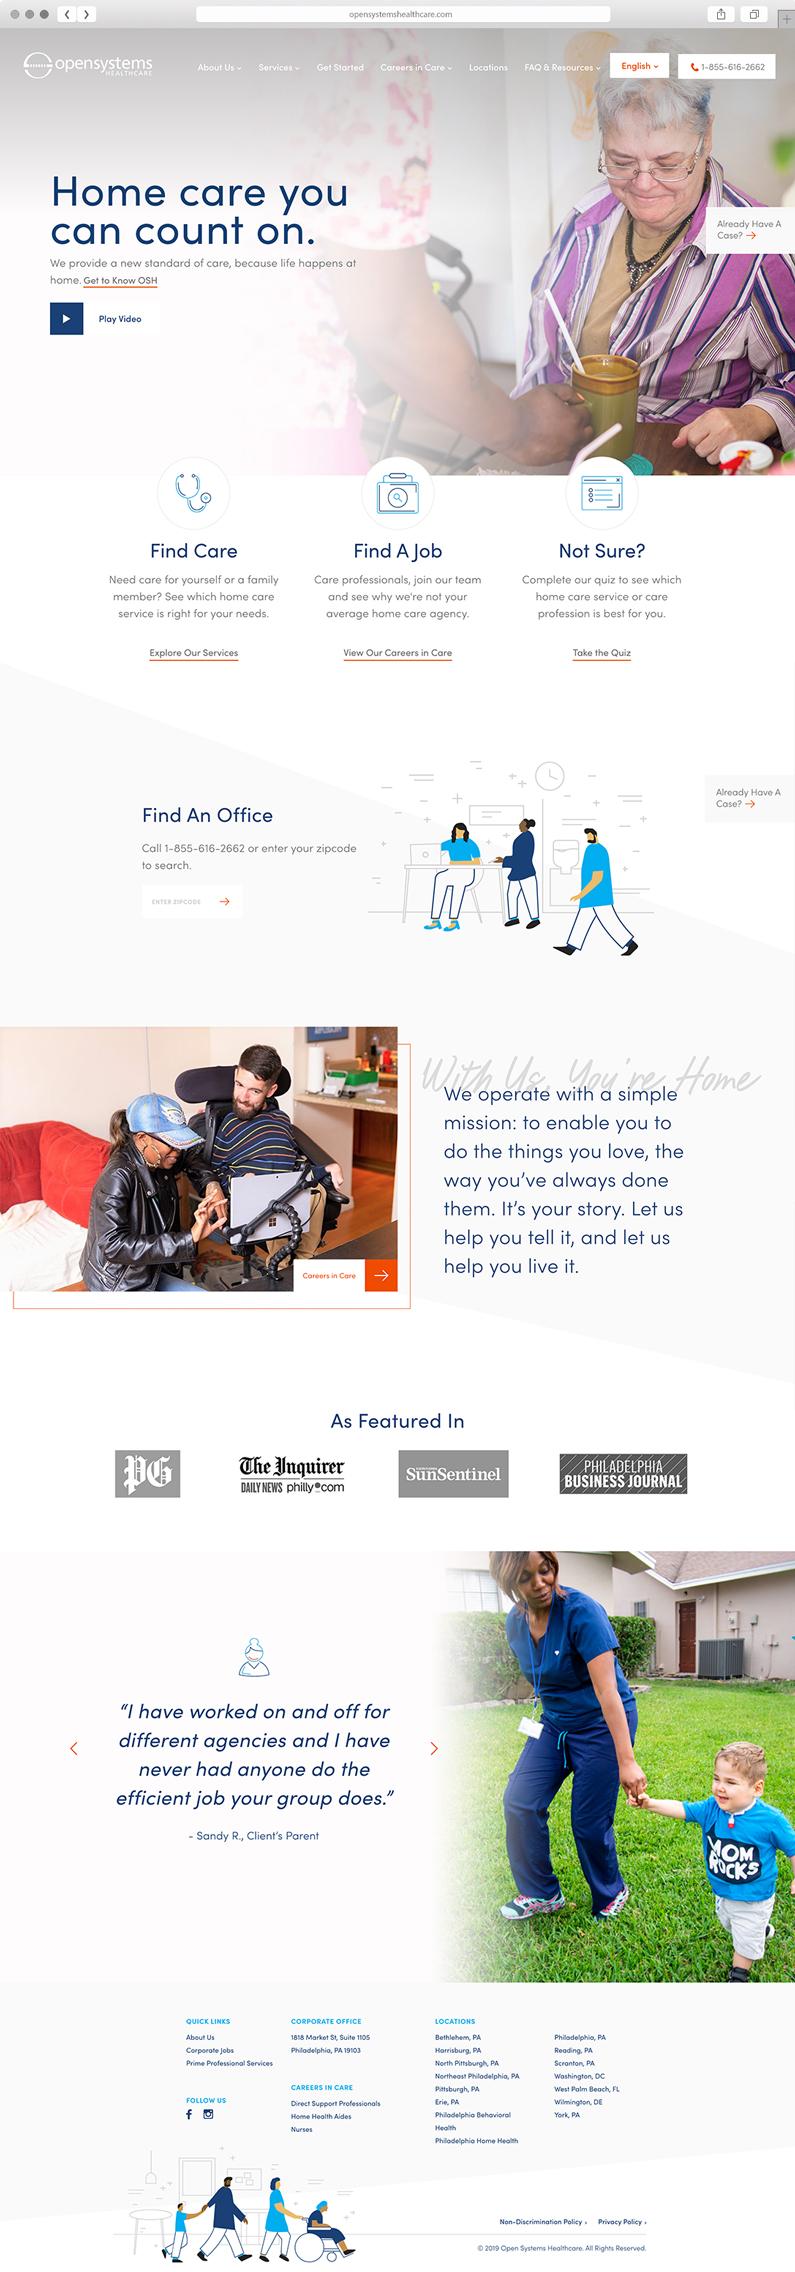 UI design for Open Systems Healthcare, a Philadelphia-based healthcare service